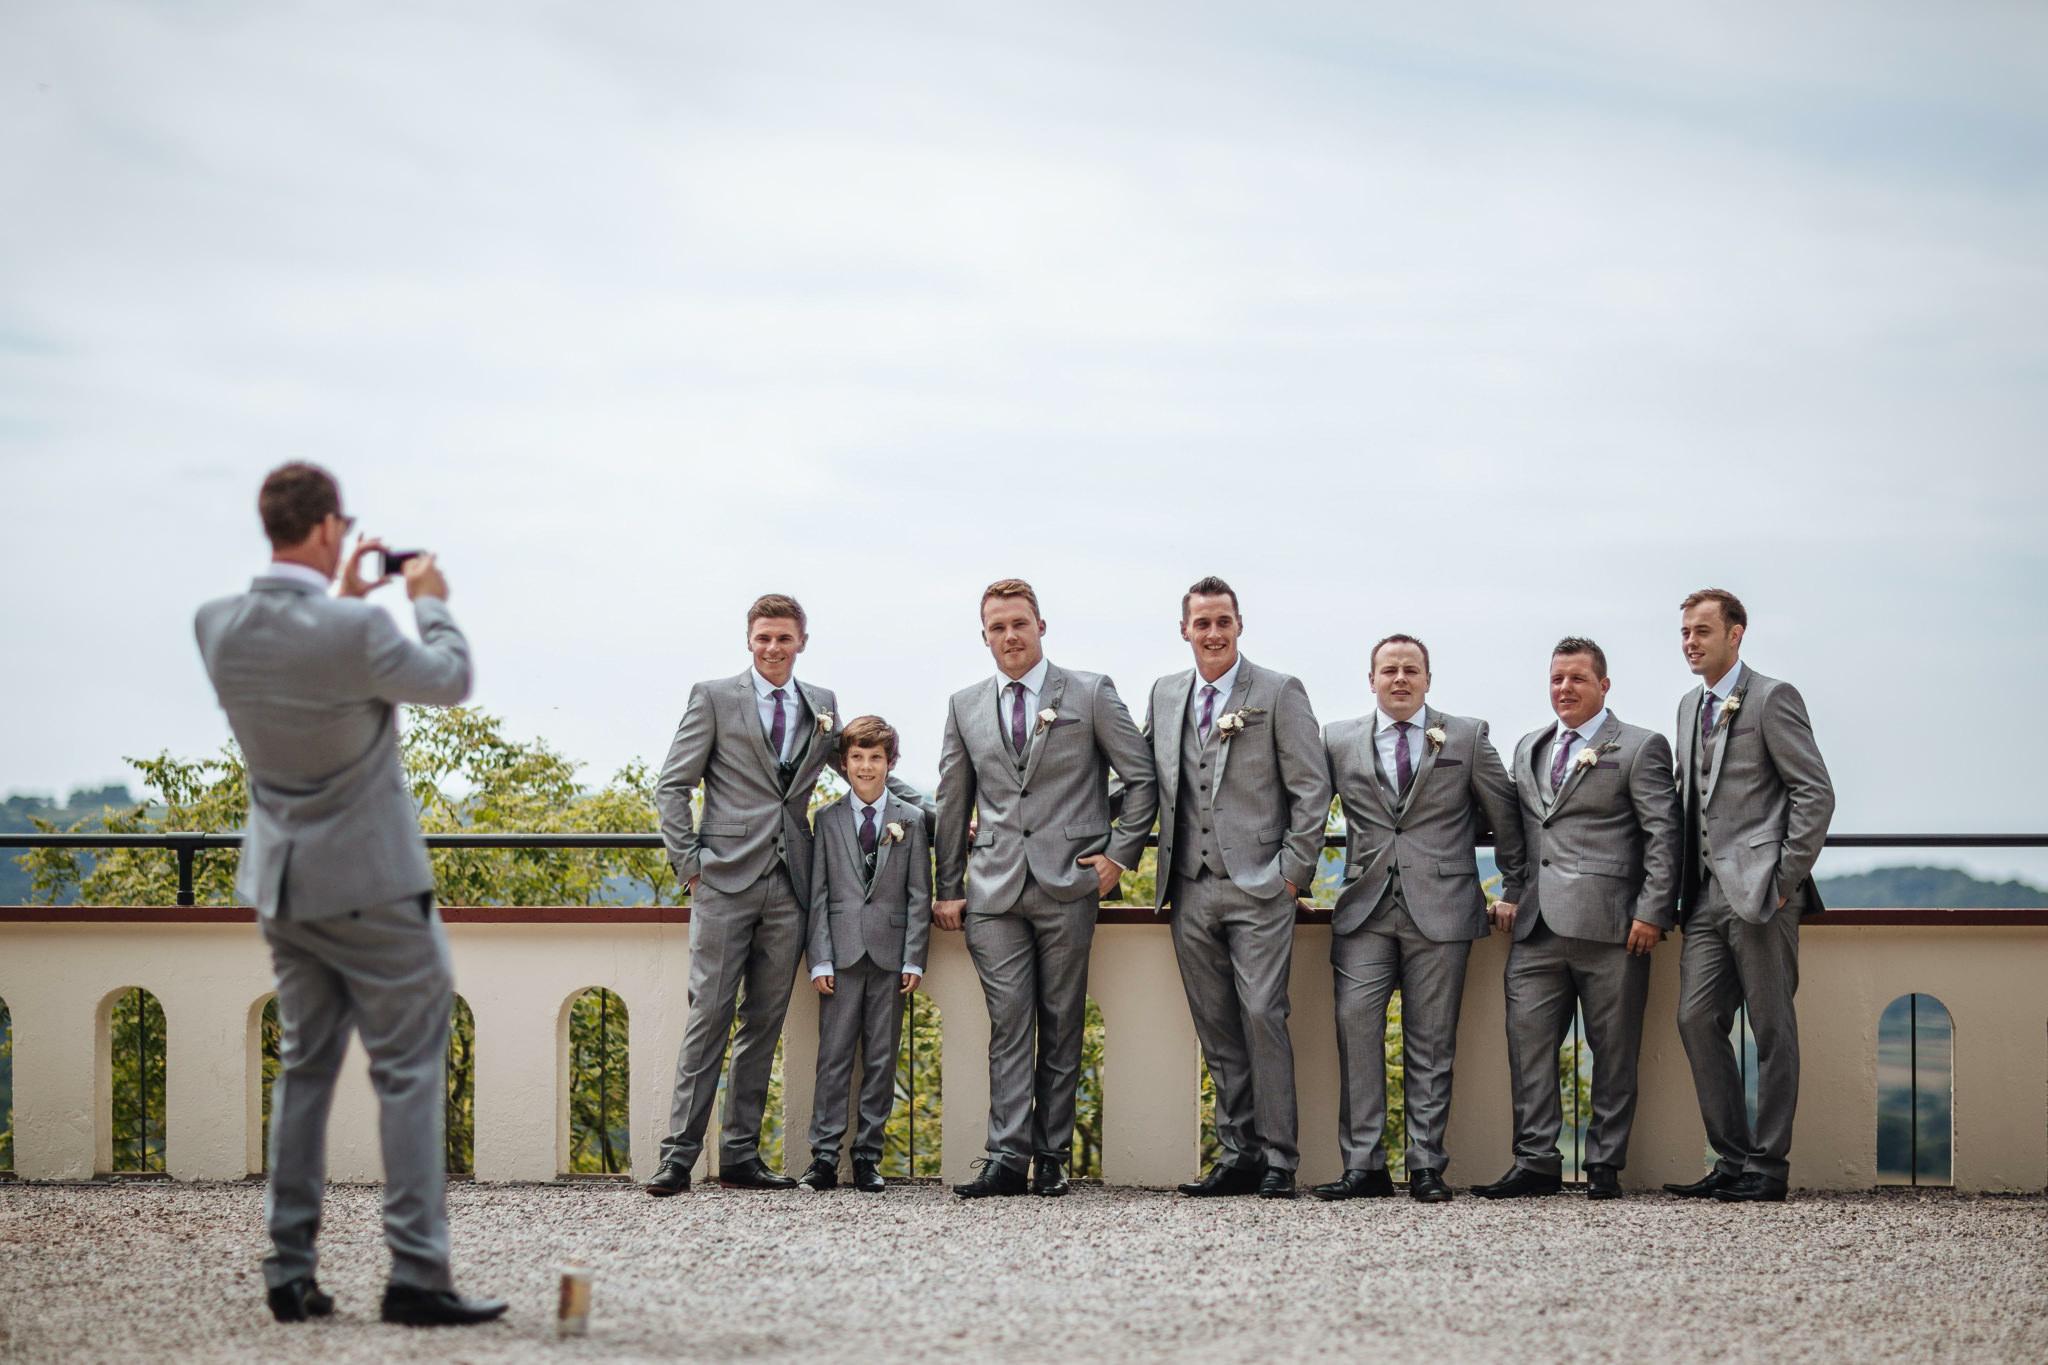 paul-marbrook-Caer-Llan-Wedding-Photographer-90028